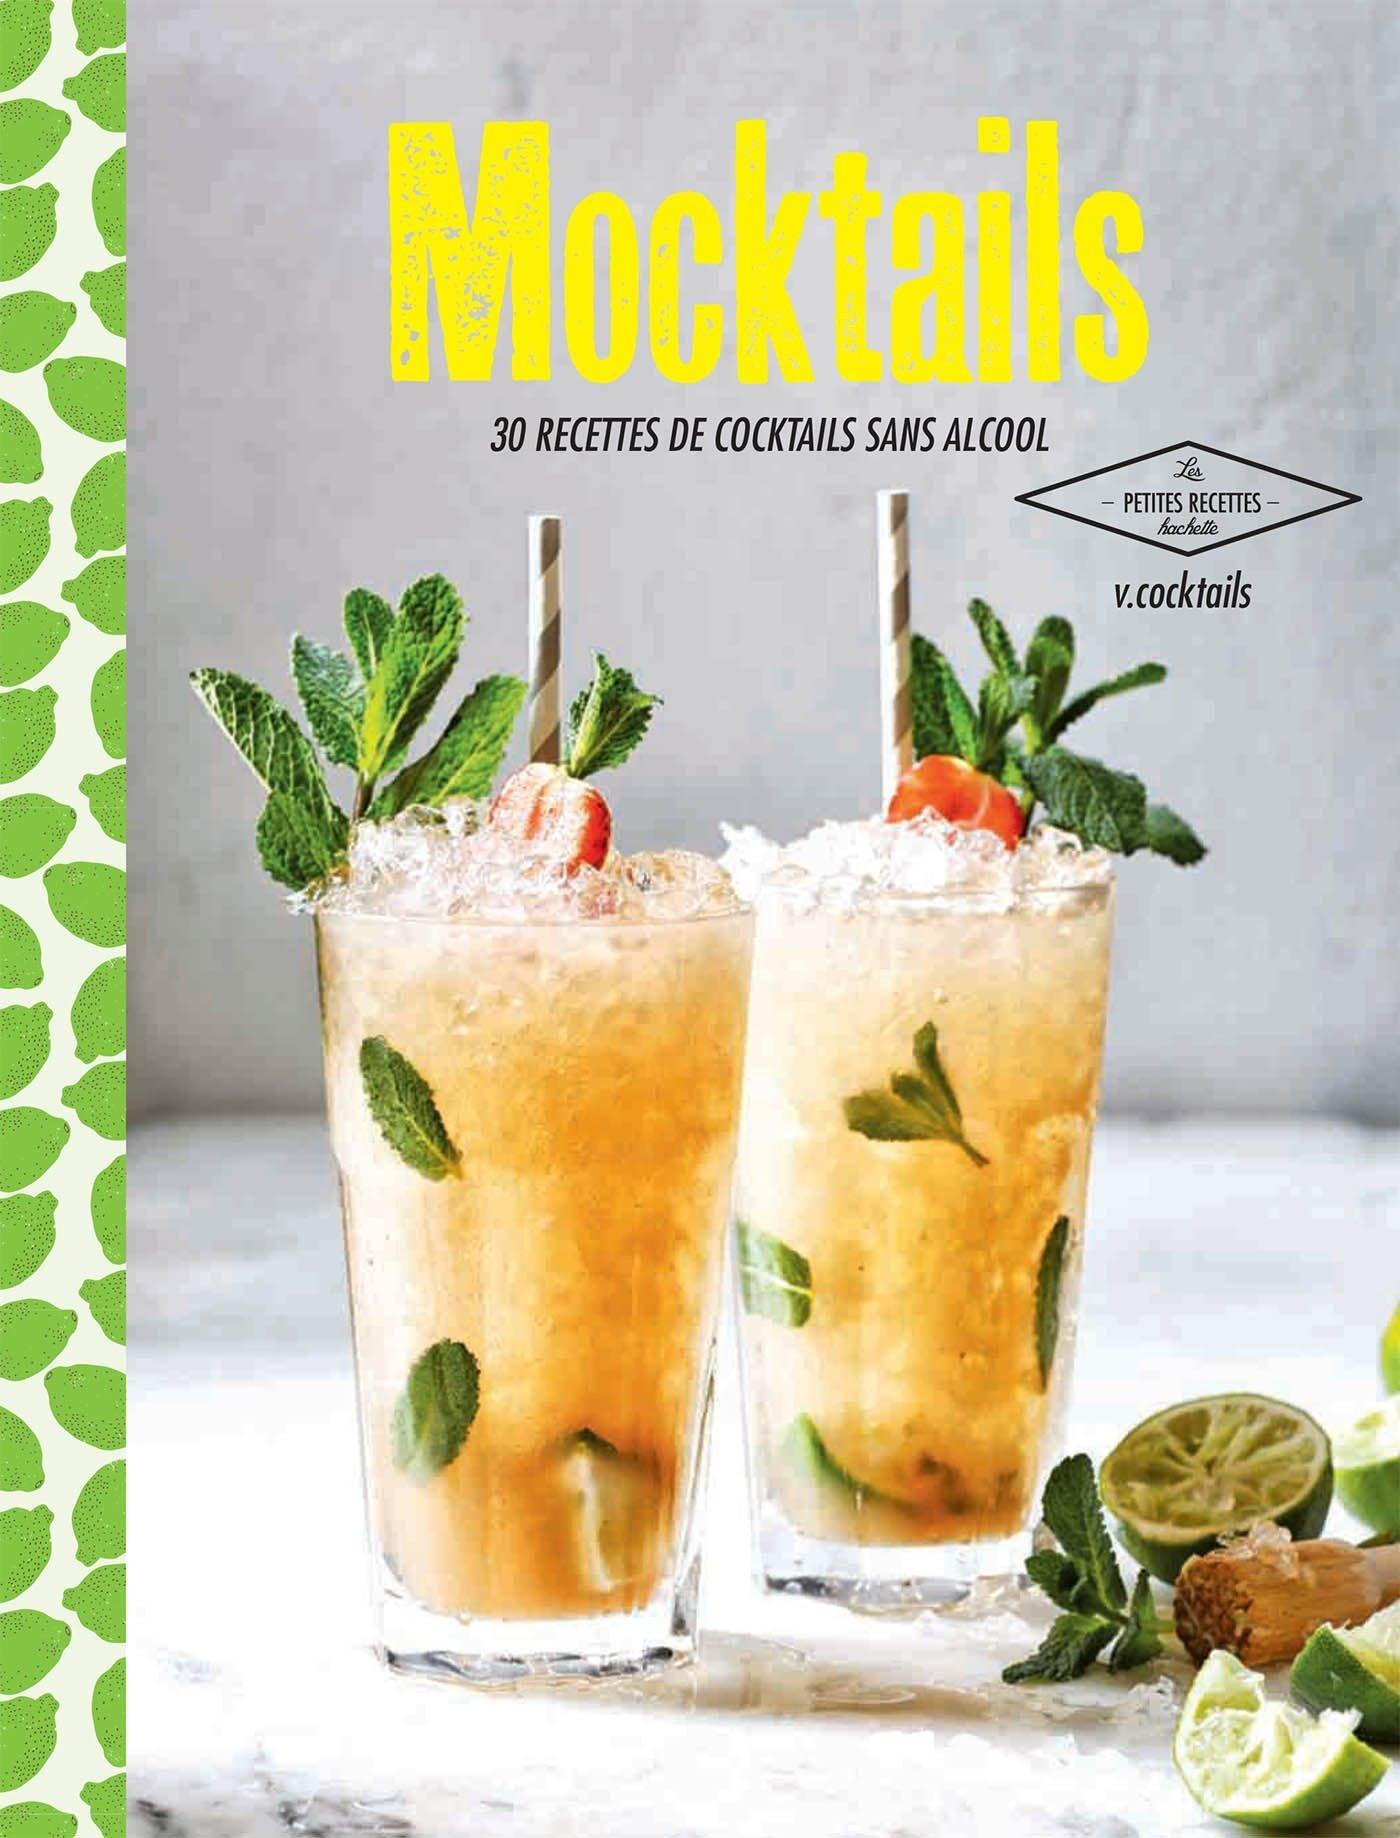 Mocktails30 De Alcool Recettes Sans Cocktails V NPXn0Ok8wZ